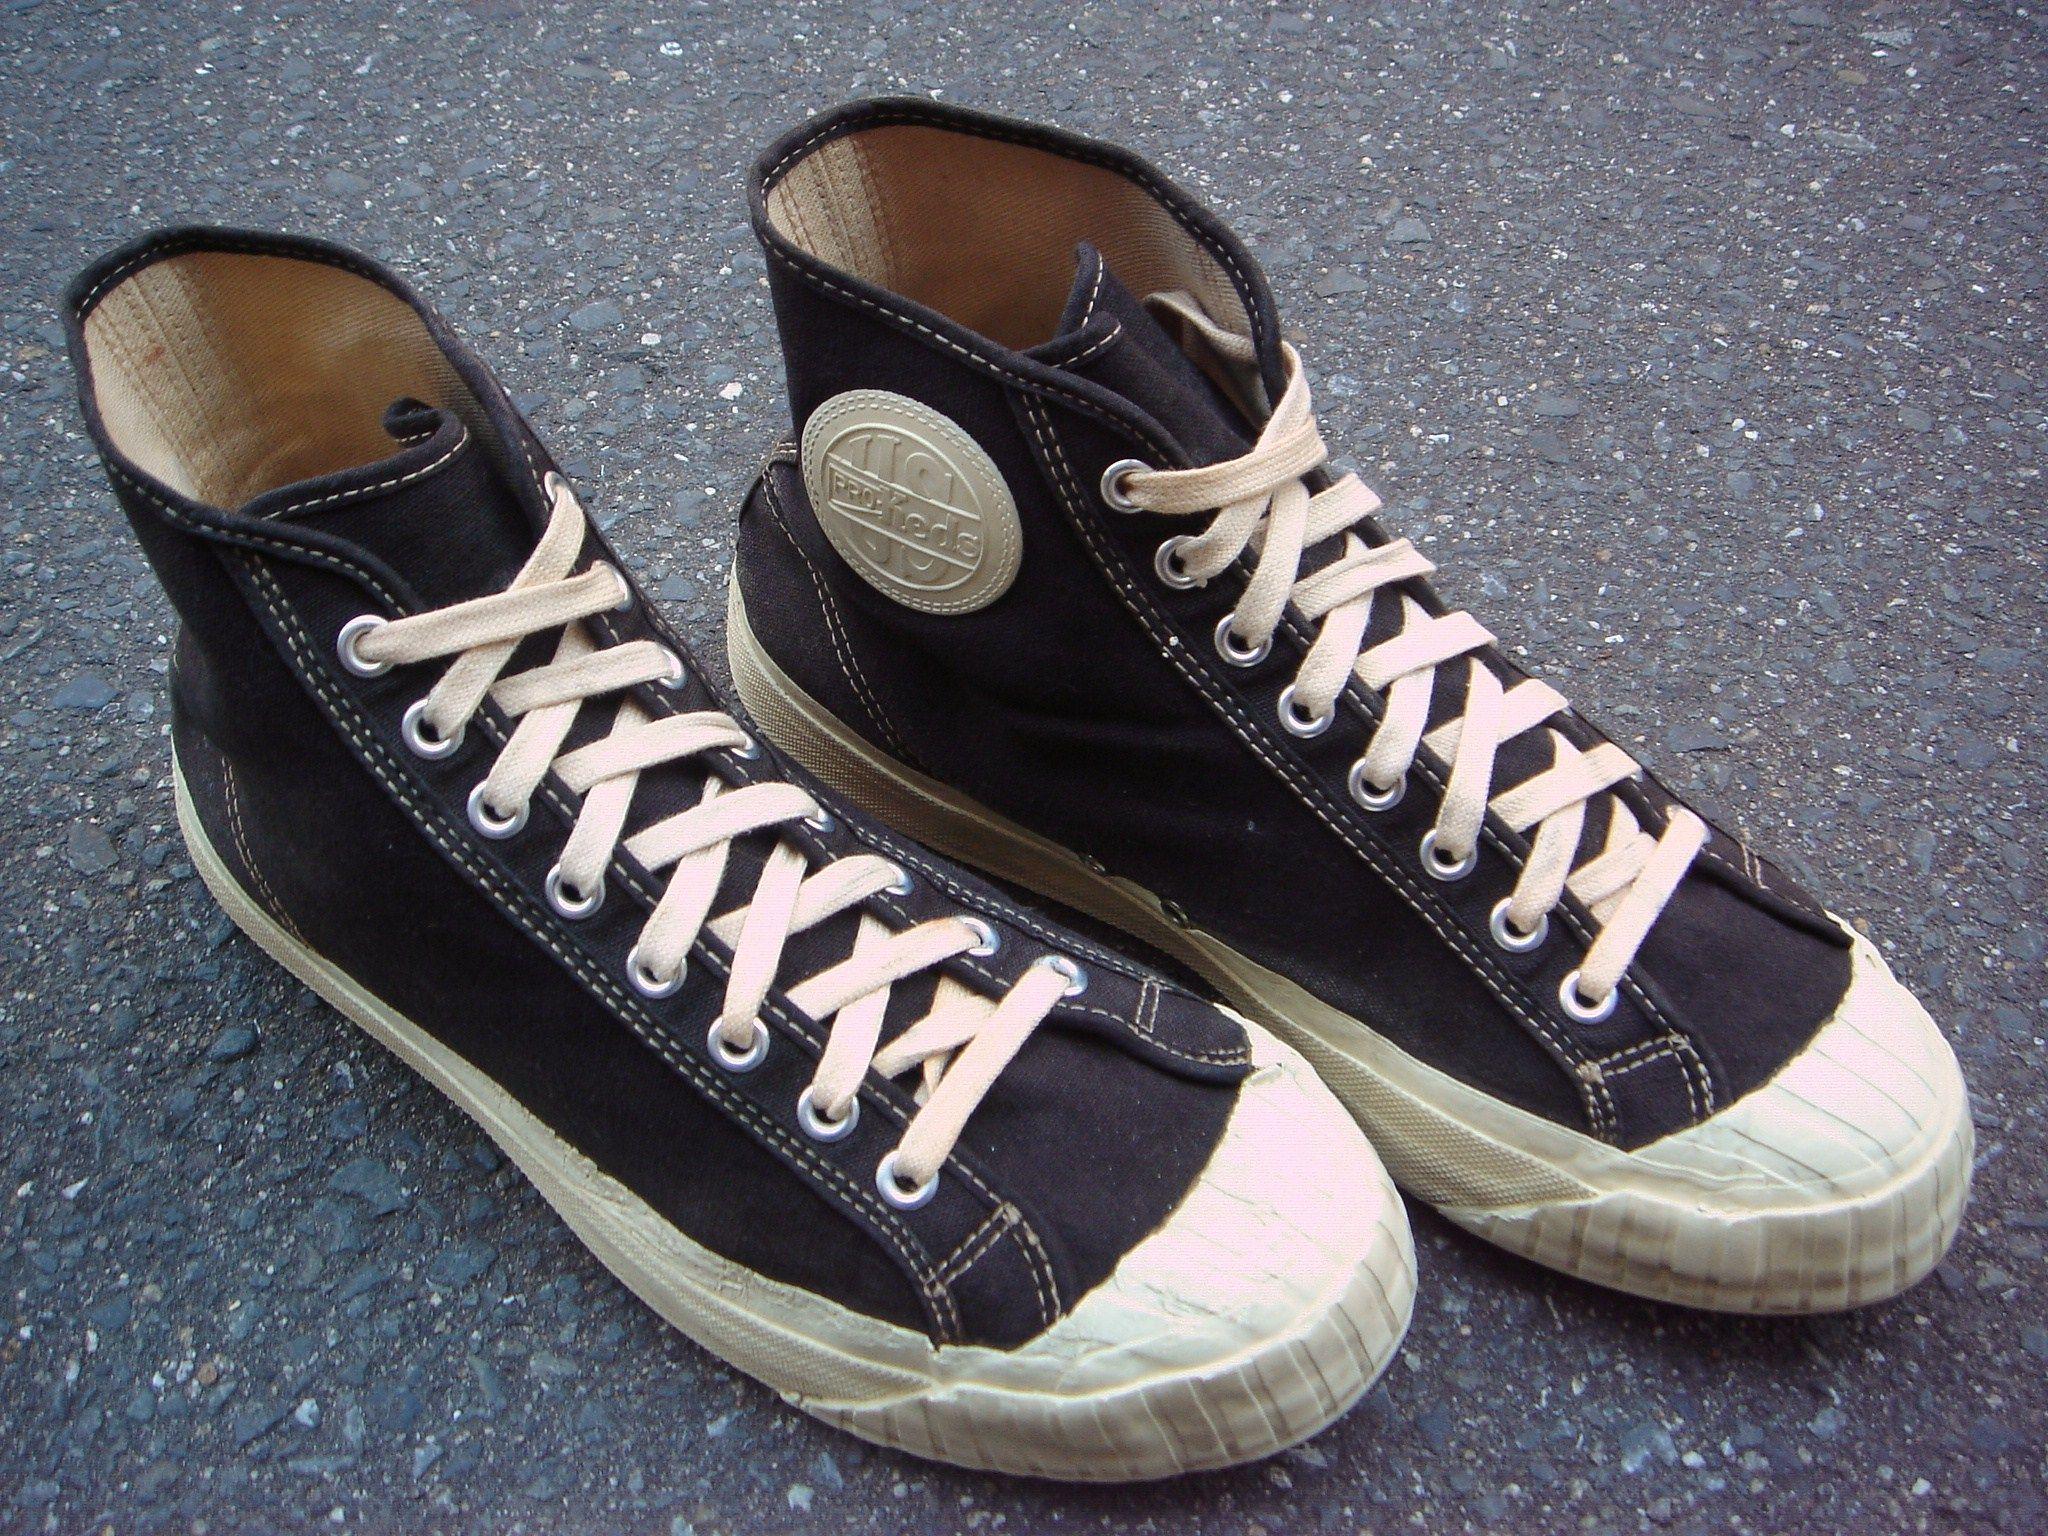 vintage keds shoes - ค้นหาด้วย Google